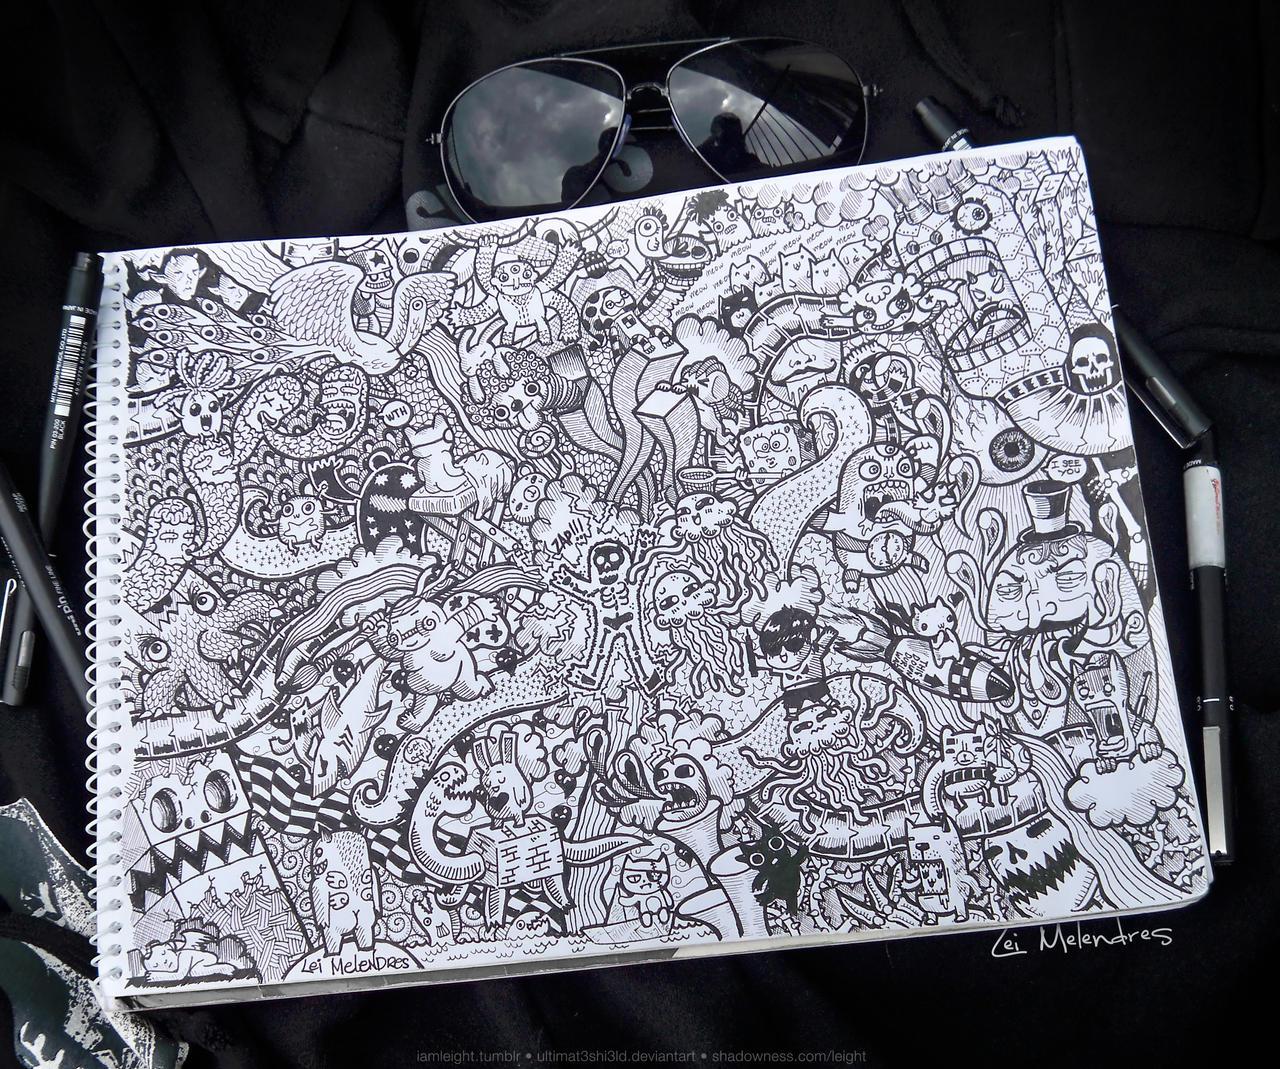 Doodle: Underworld by LeiMelendres